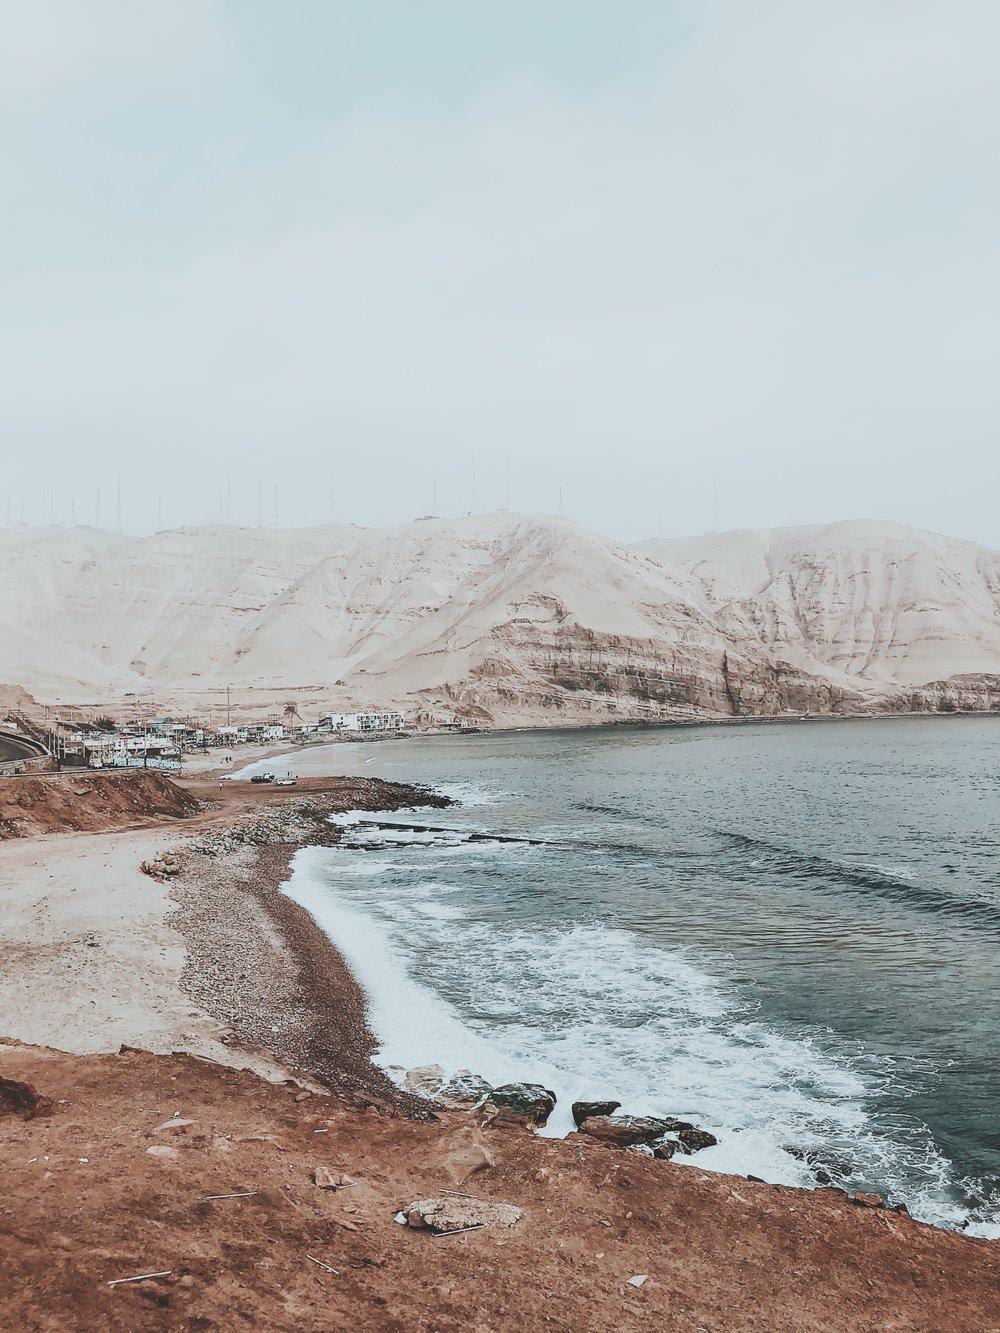 La herradura, Chorillos - Peru - fotos @ danmagatti  com iPhone 8 plus